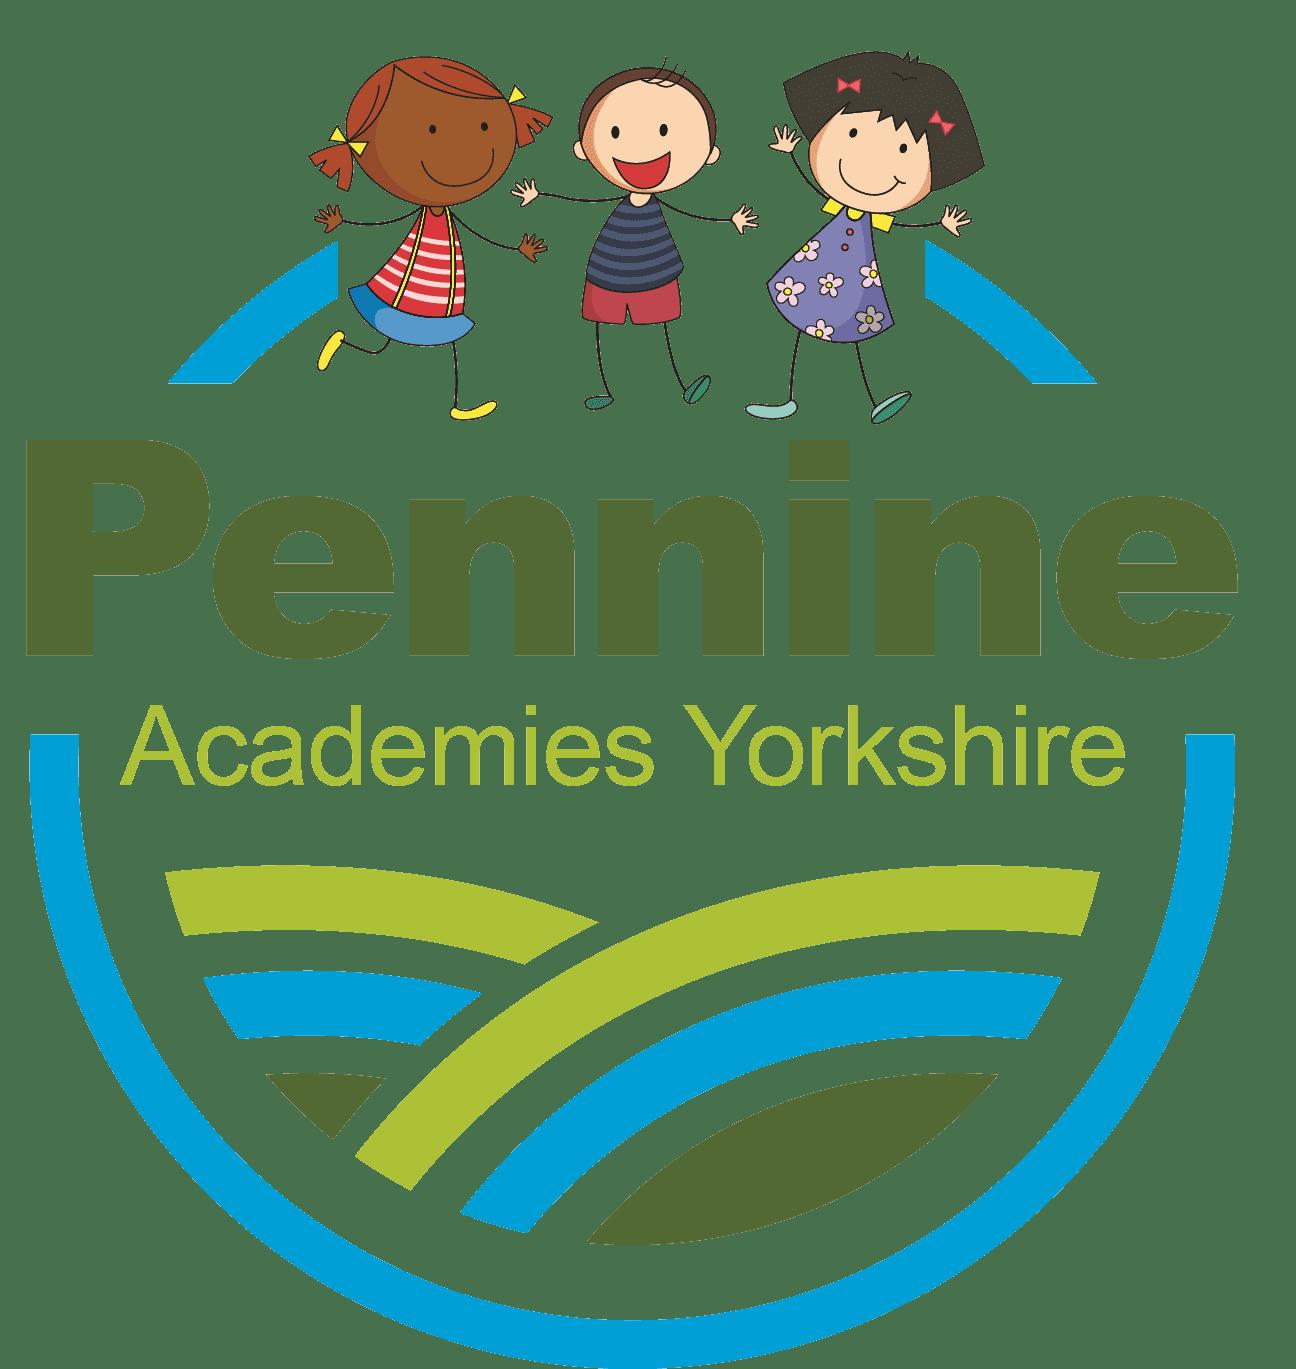 pennine academies logo